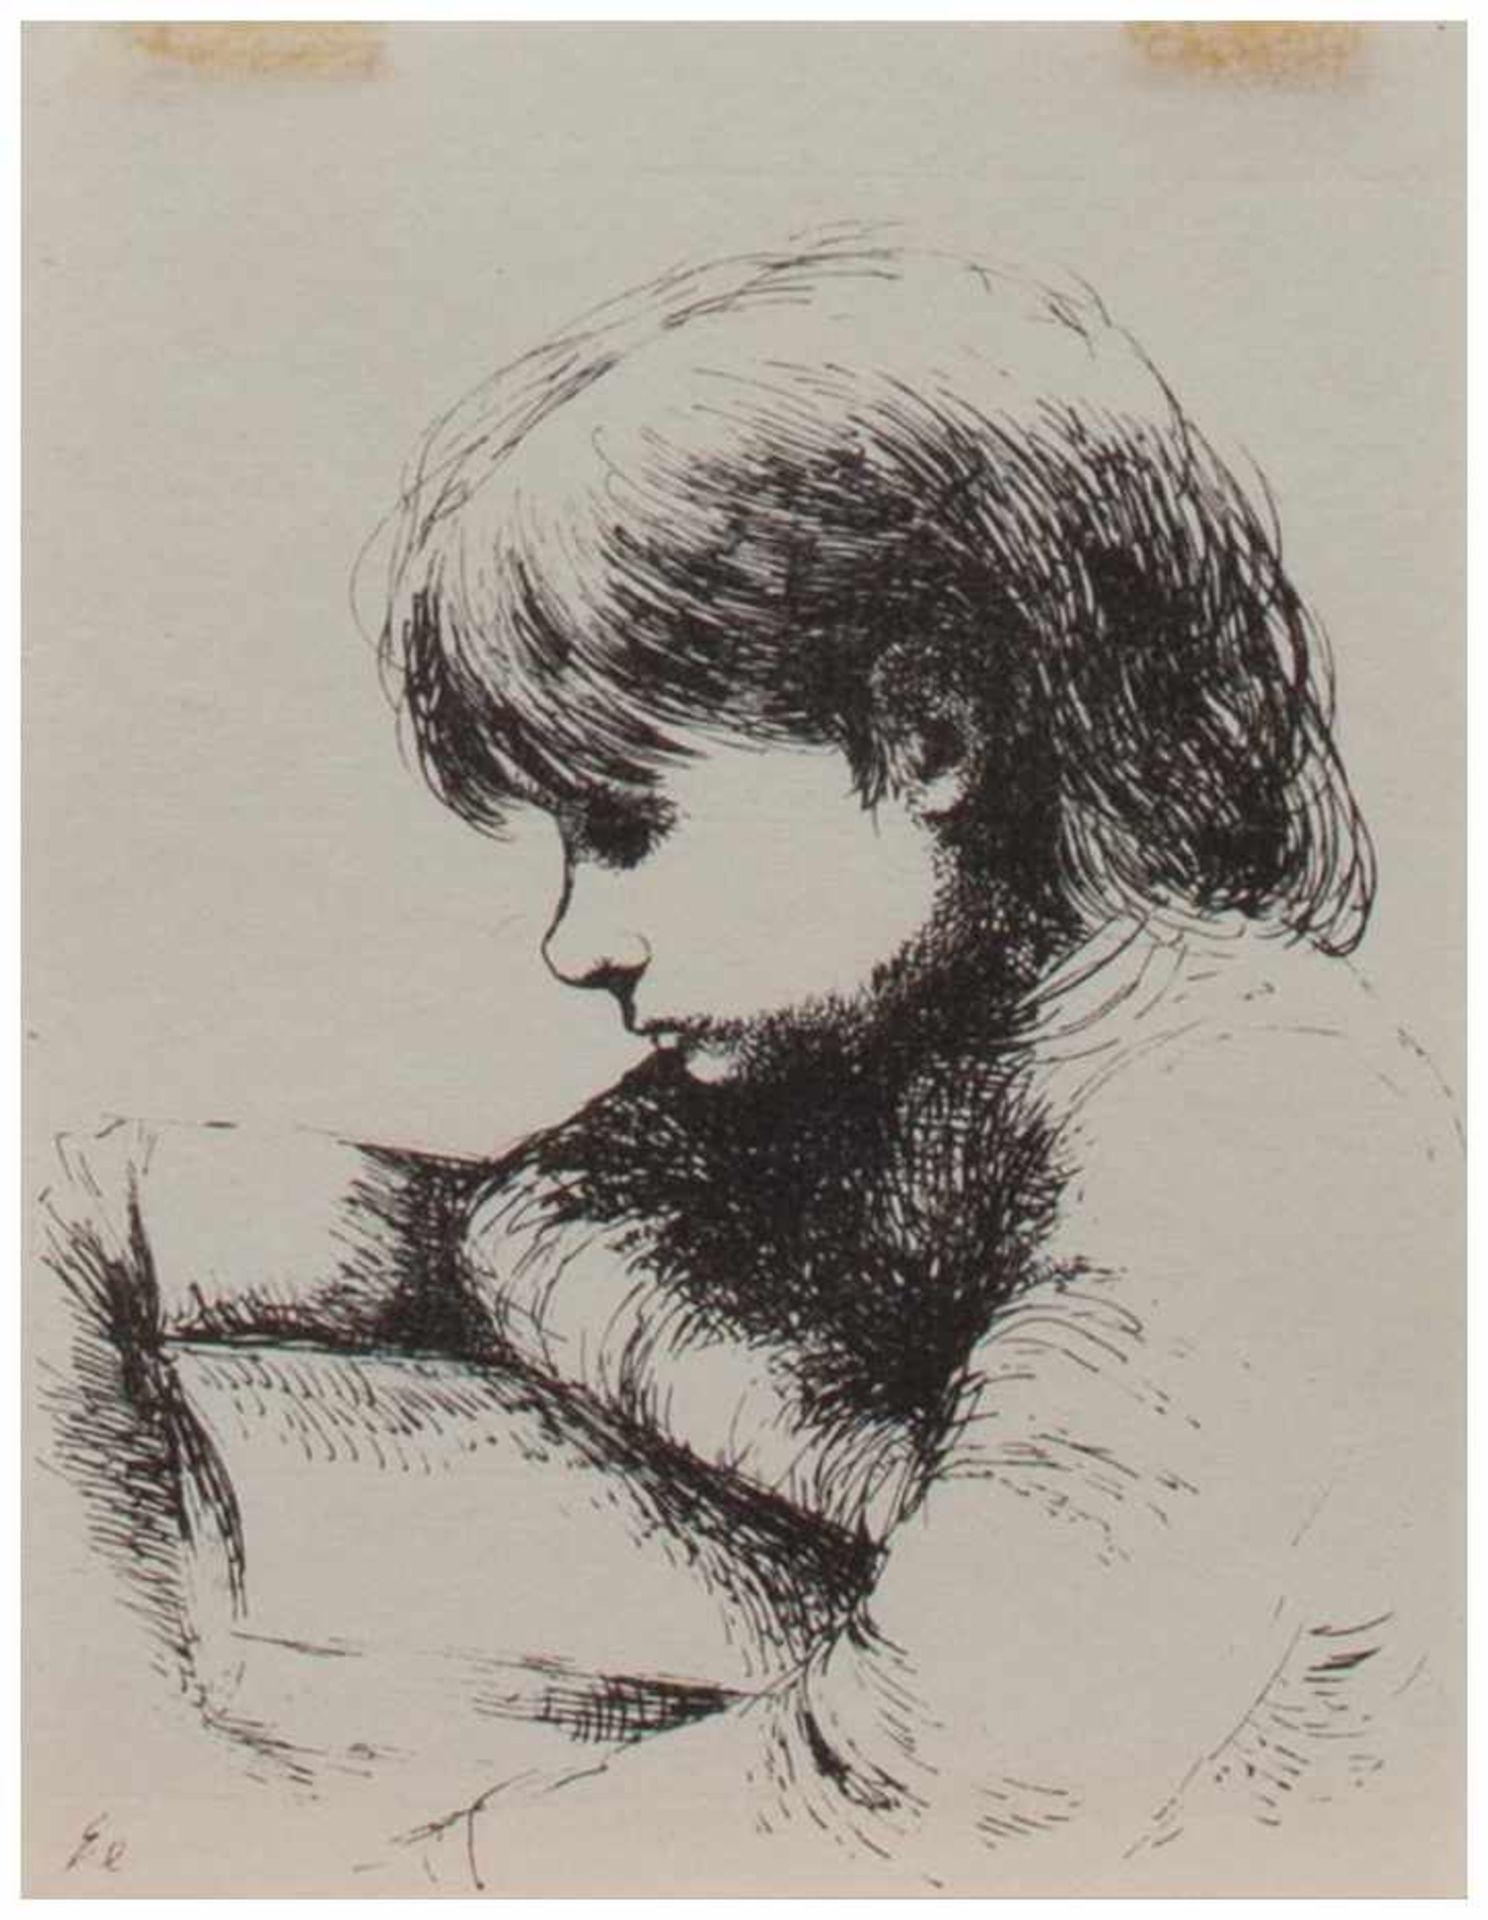 Los 33 - Hanna Nagel (Heidelberg 1907 - 1975 ebenda, Zeichnerin, Graphikerin u. Illustratorin, Std. i.